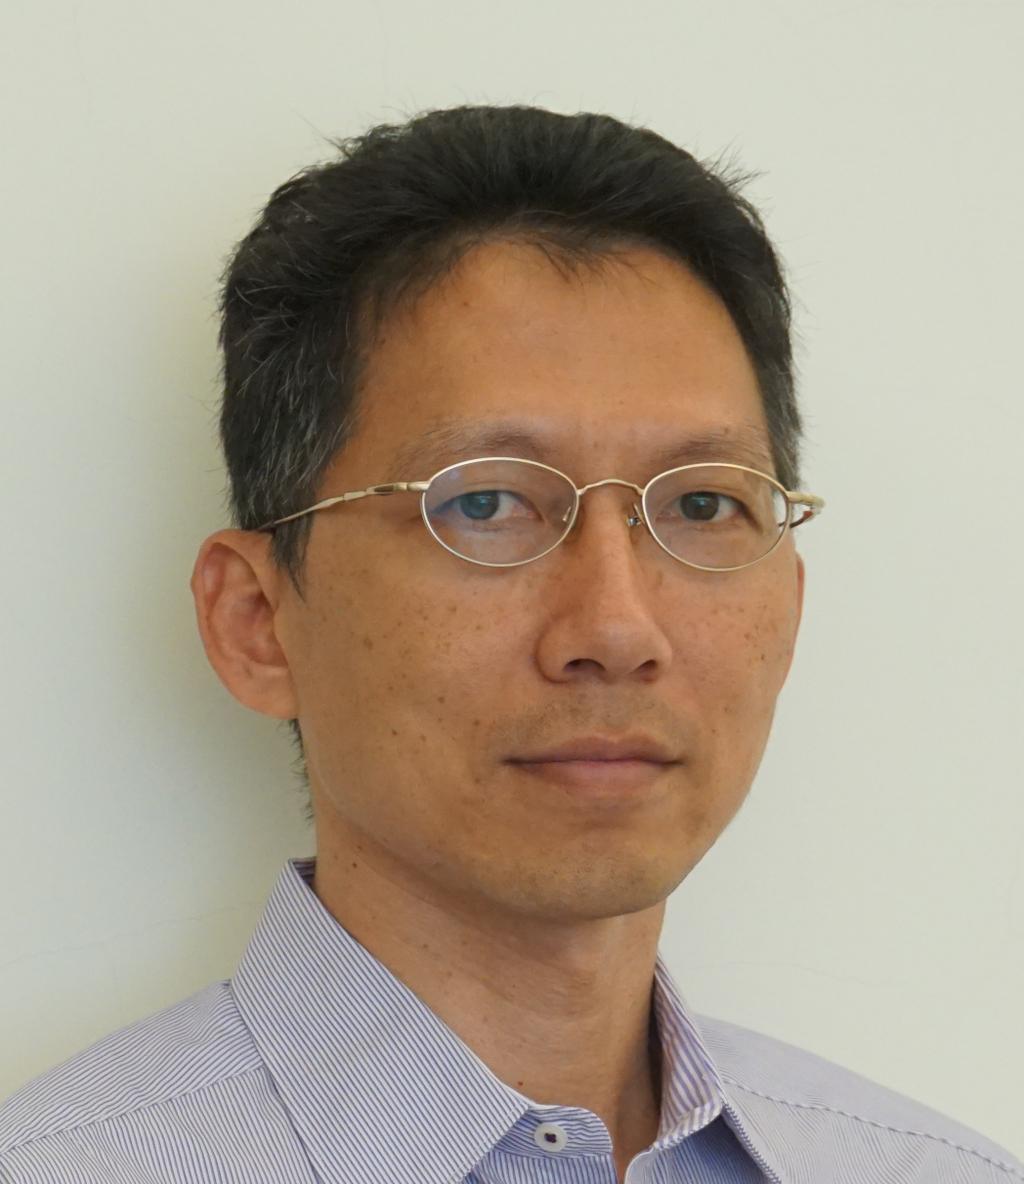 Speaker WasiKevin's avatar